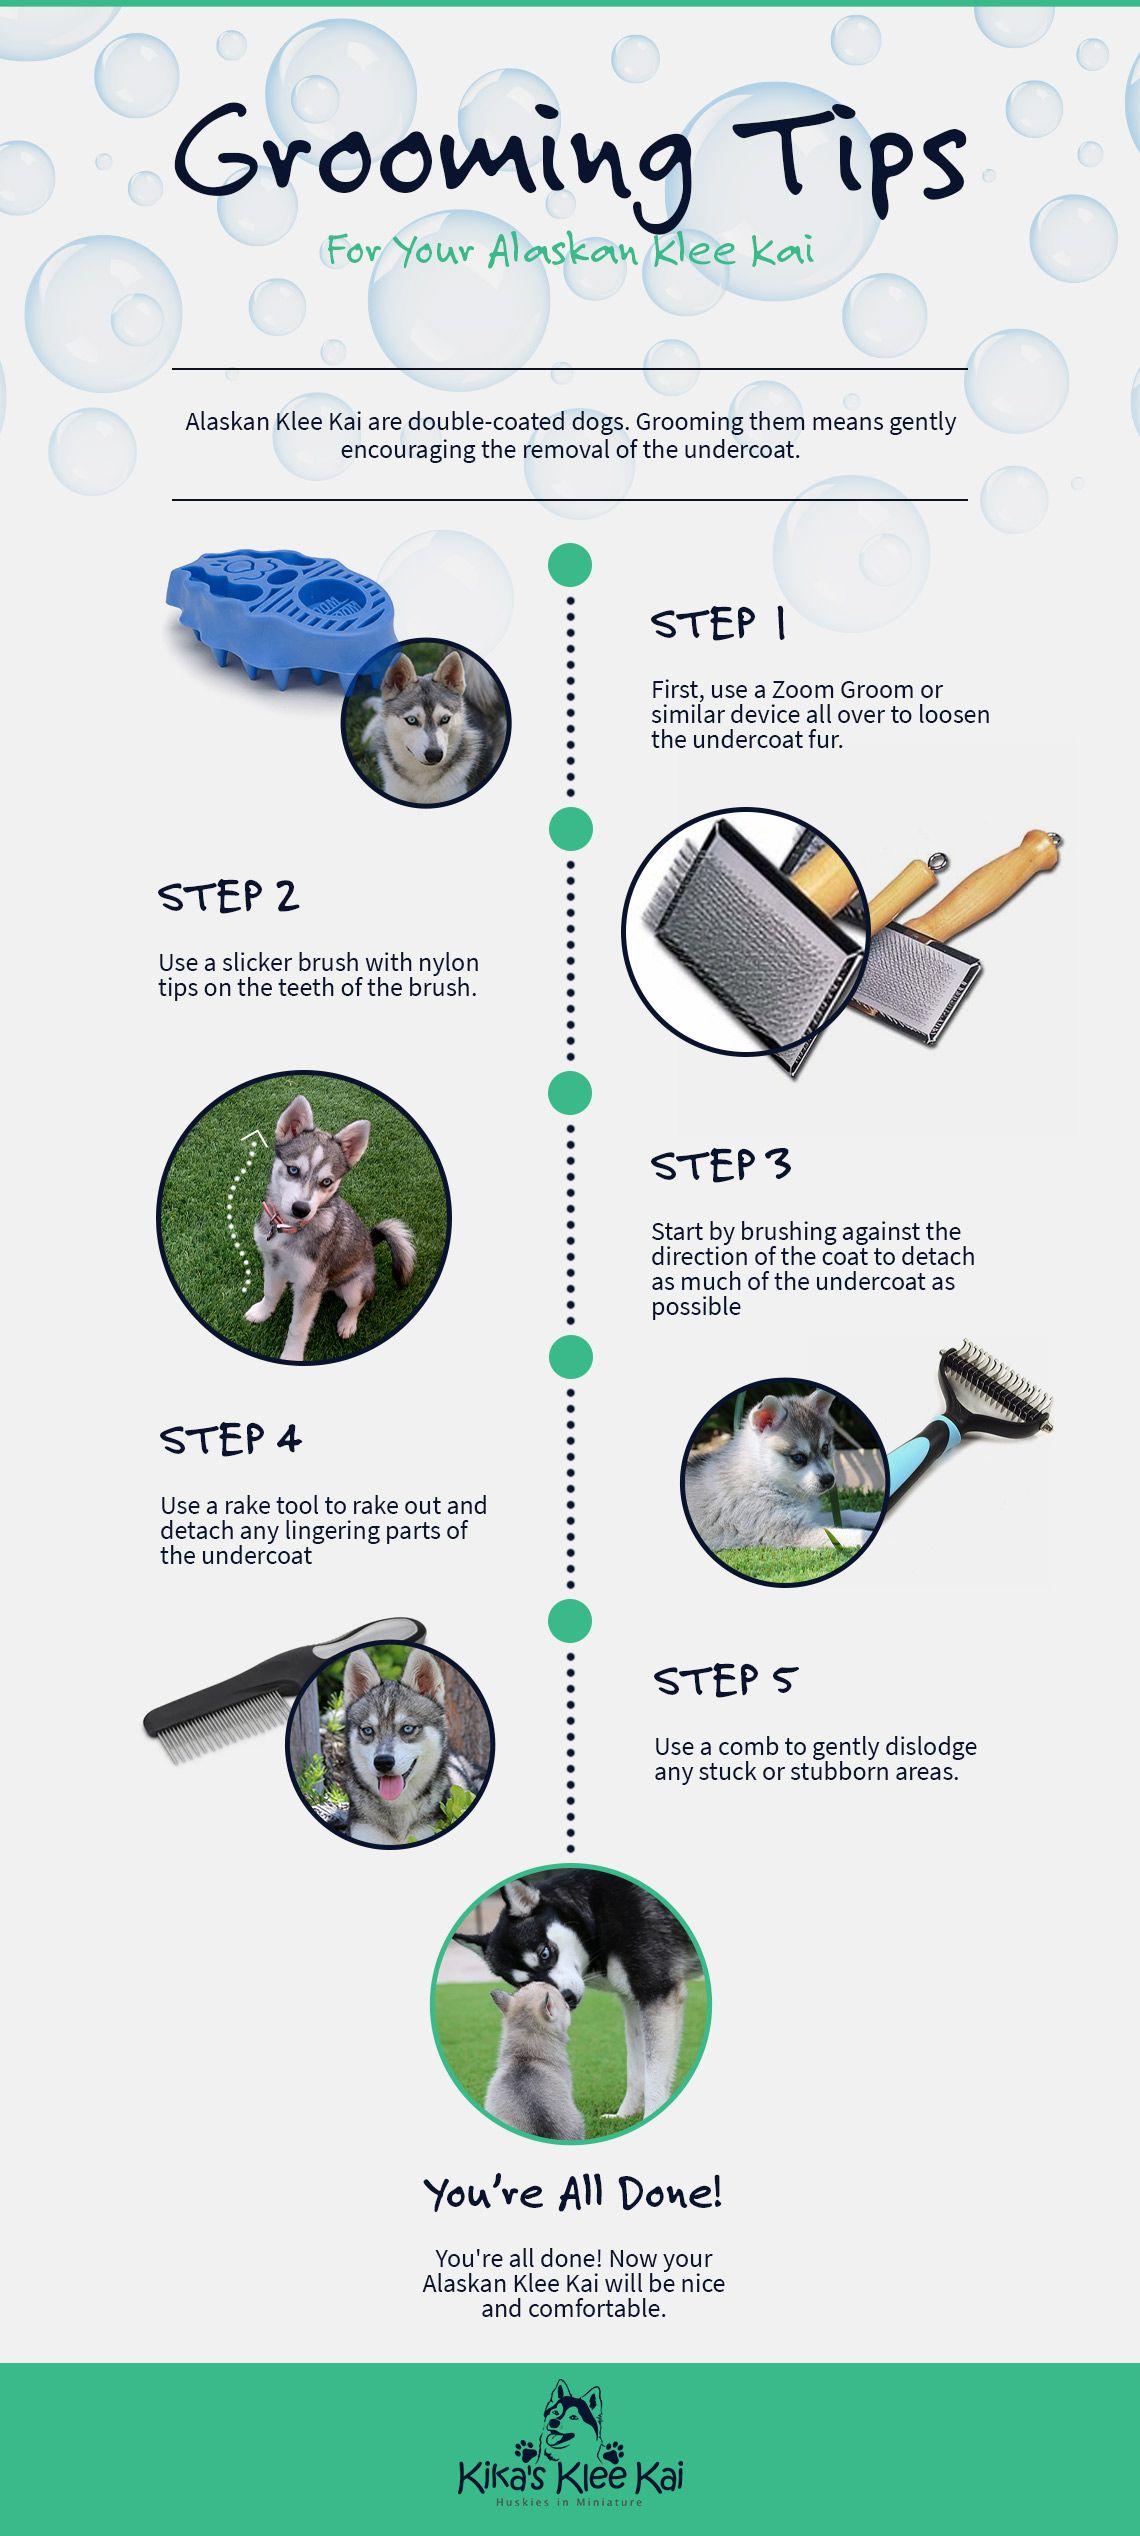 Grooming Tips For Your Alaskan Klee Kai.jpg